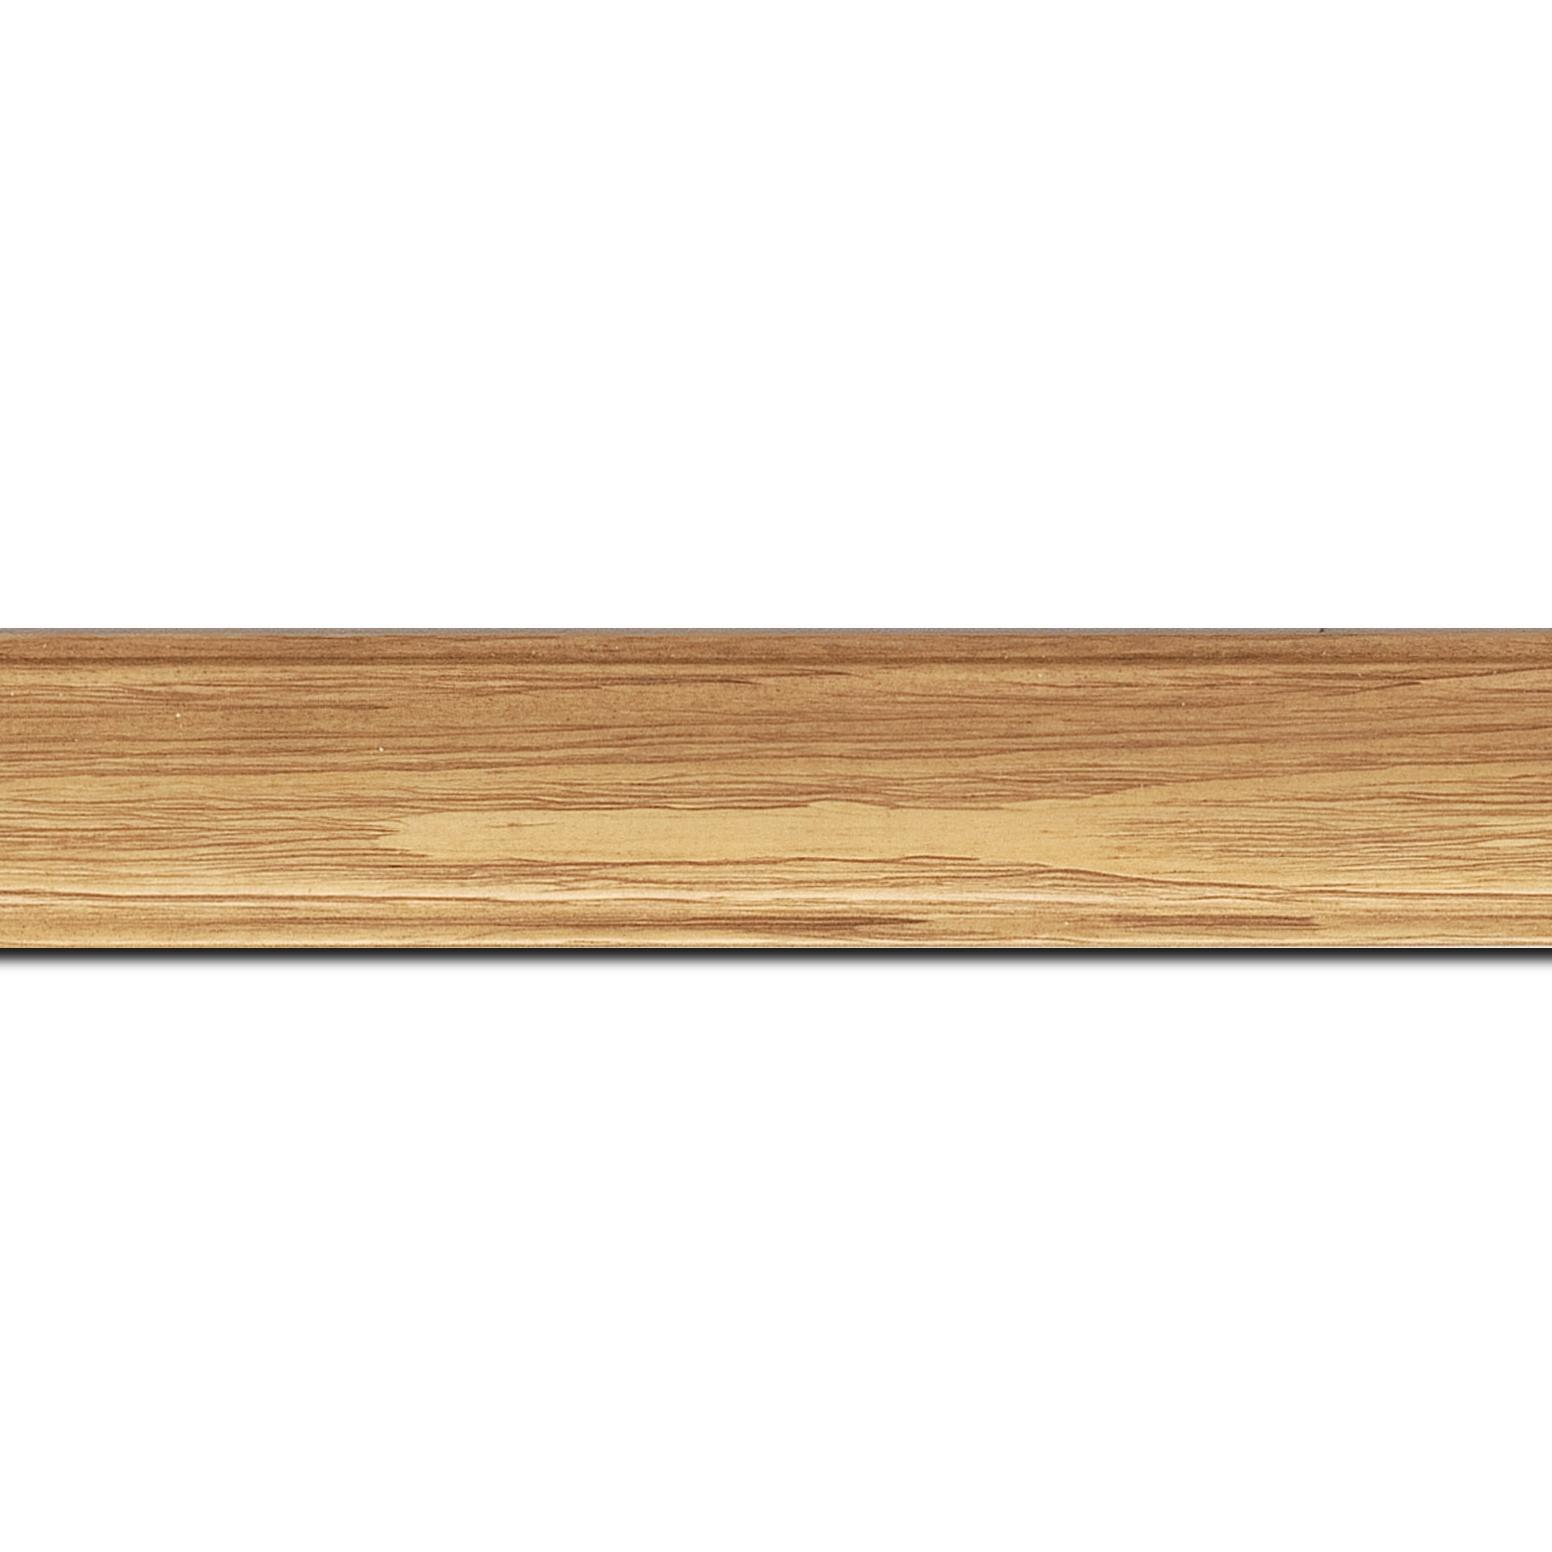 cadre bois naturel 30x40 pas cher cadre photo bois naturel 30x40 destock cadre. Black Bedroom Furniture Sets. Home Design Ideas